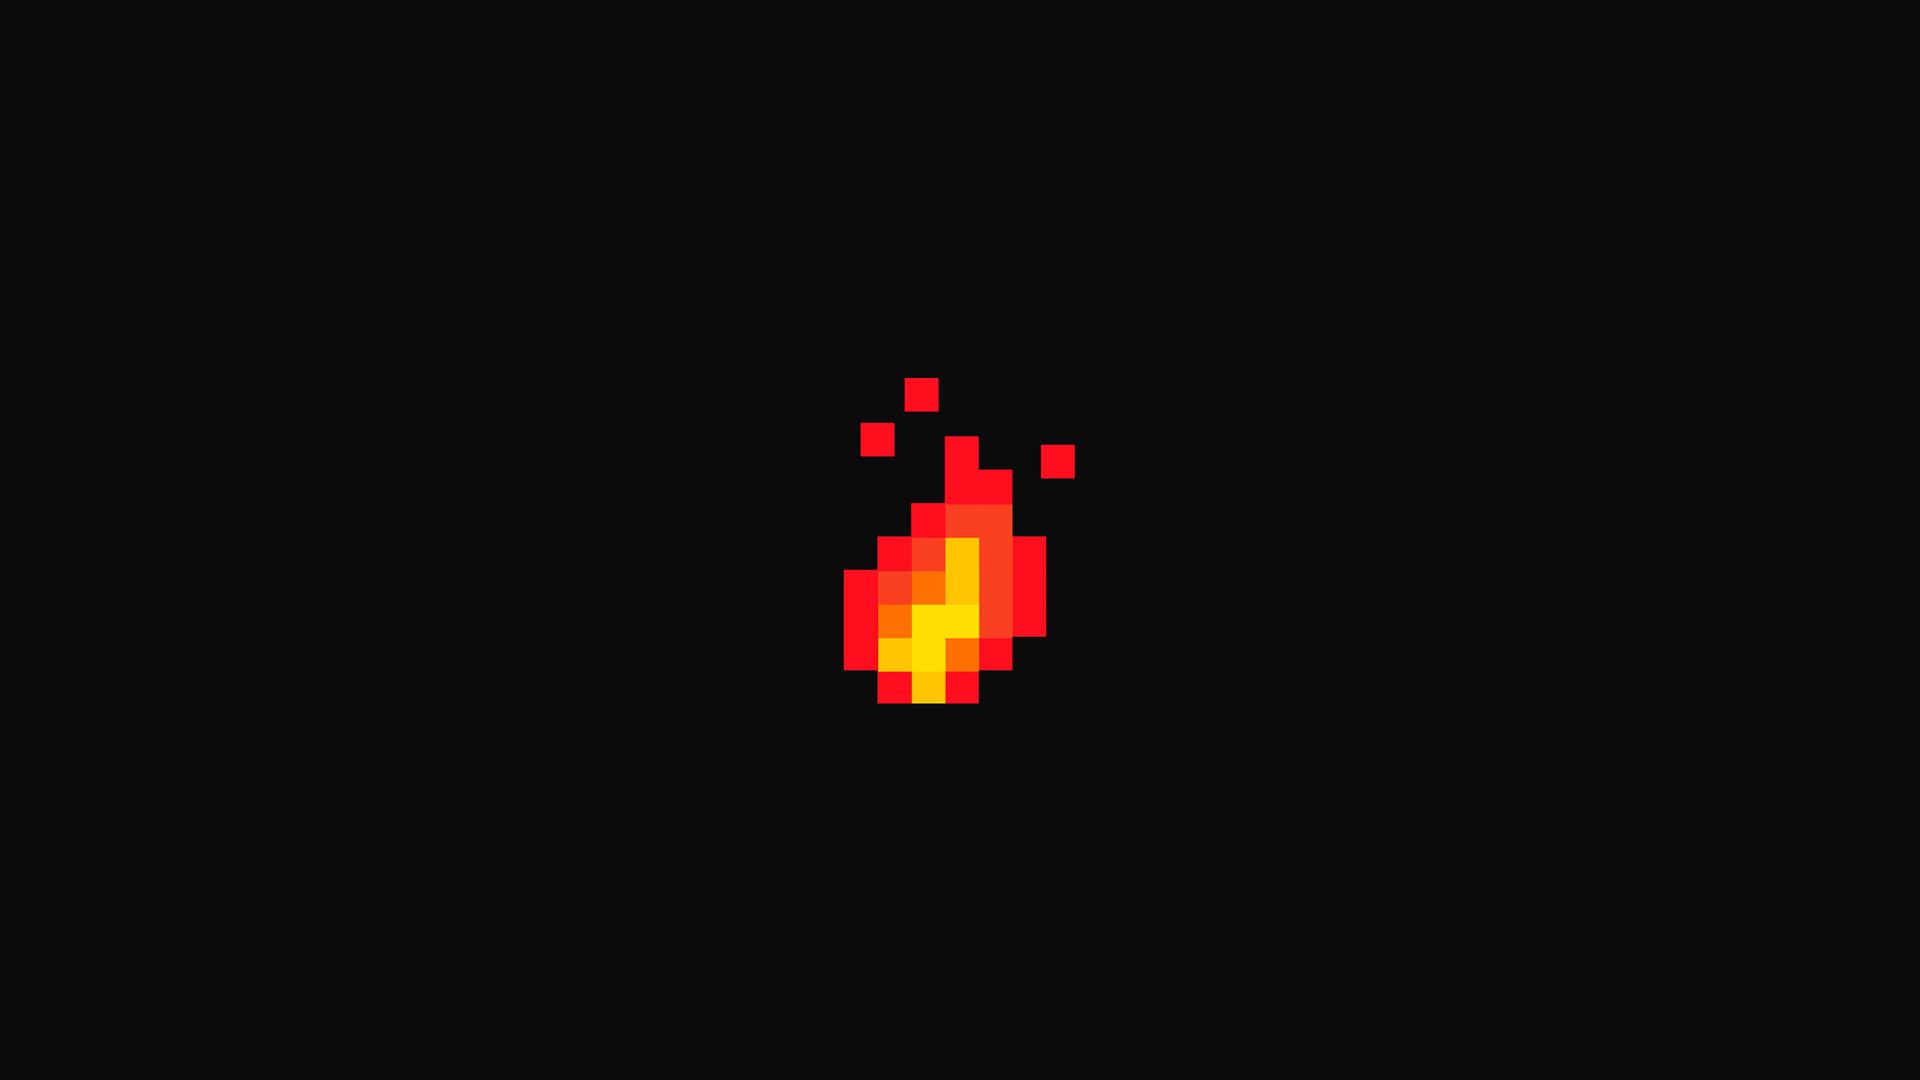 8 Bit Digital Fire